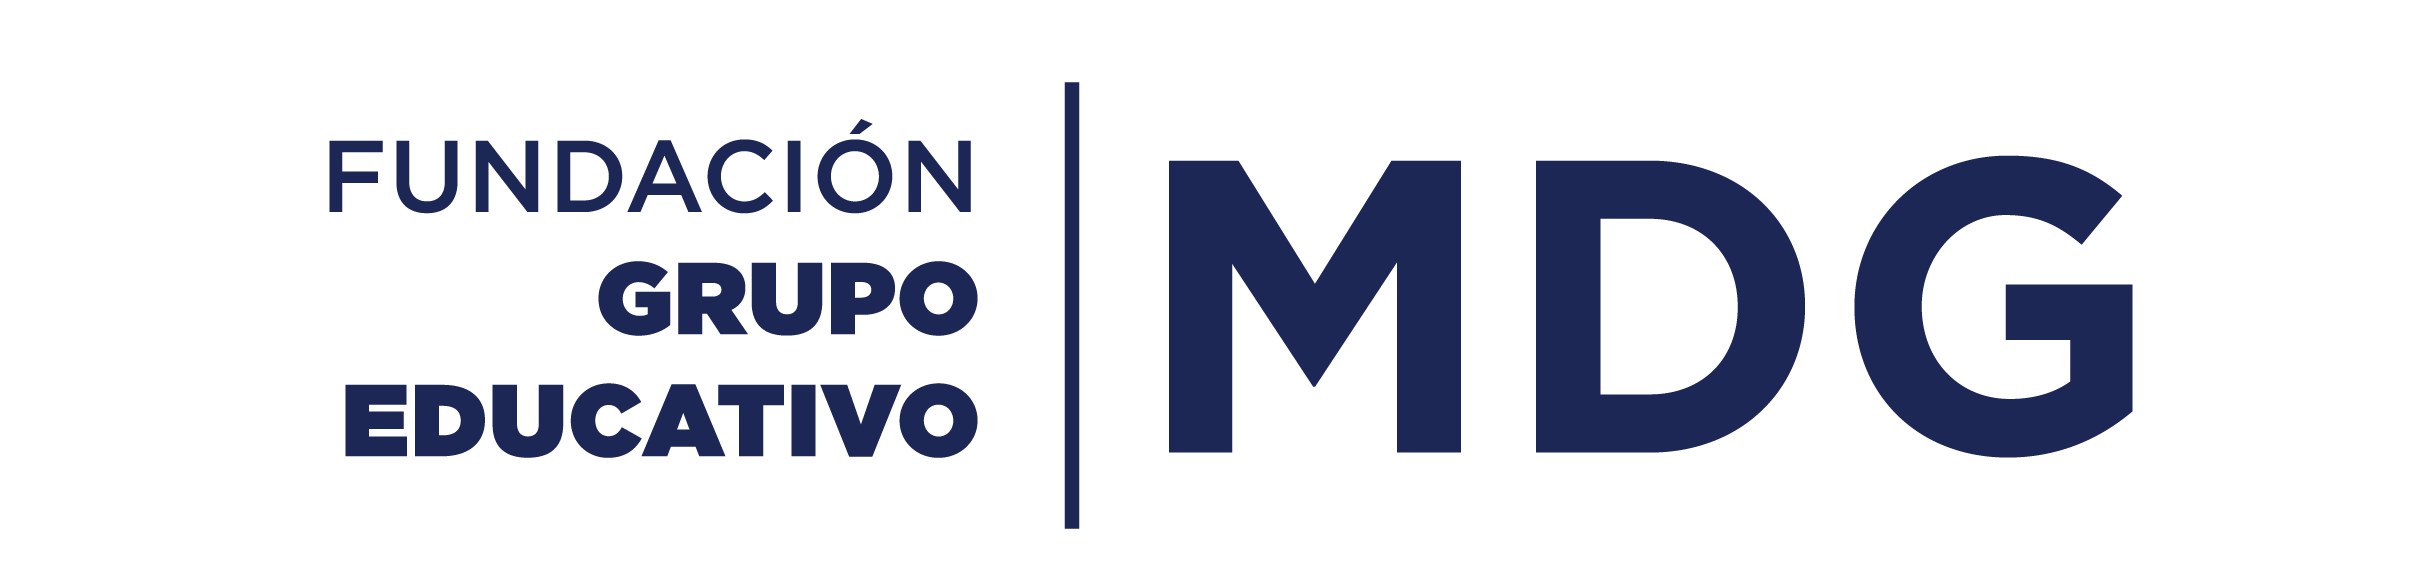 Fundación Grupo Educativo María de Guadalupe